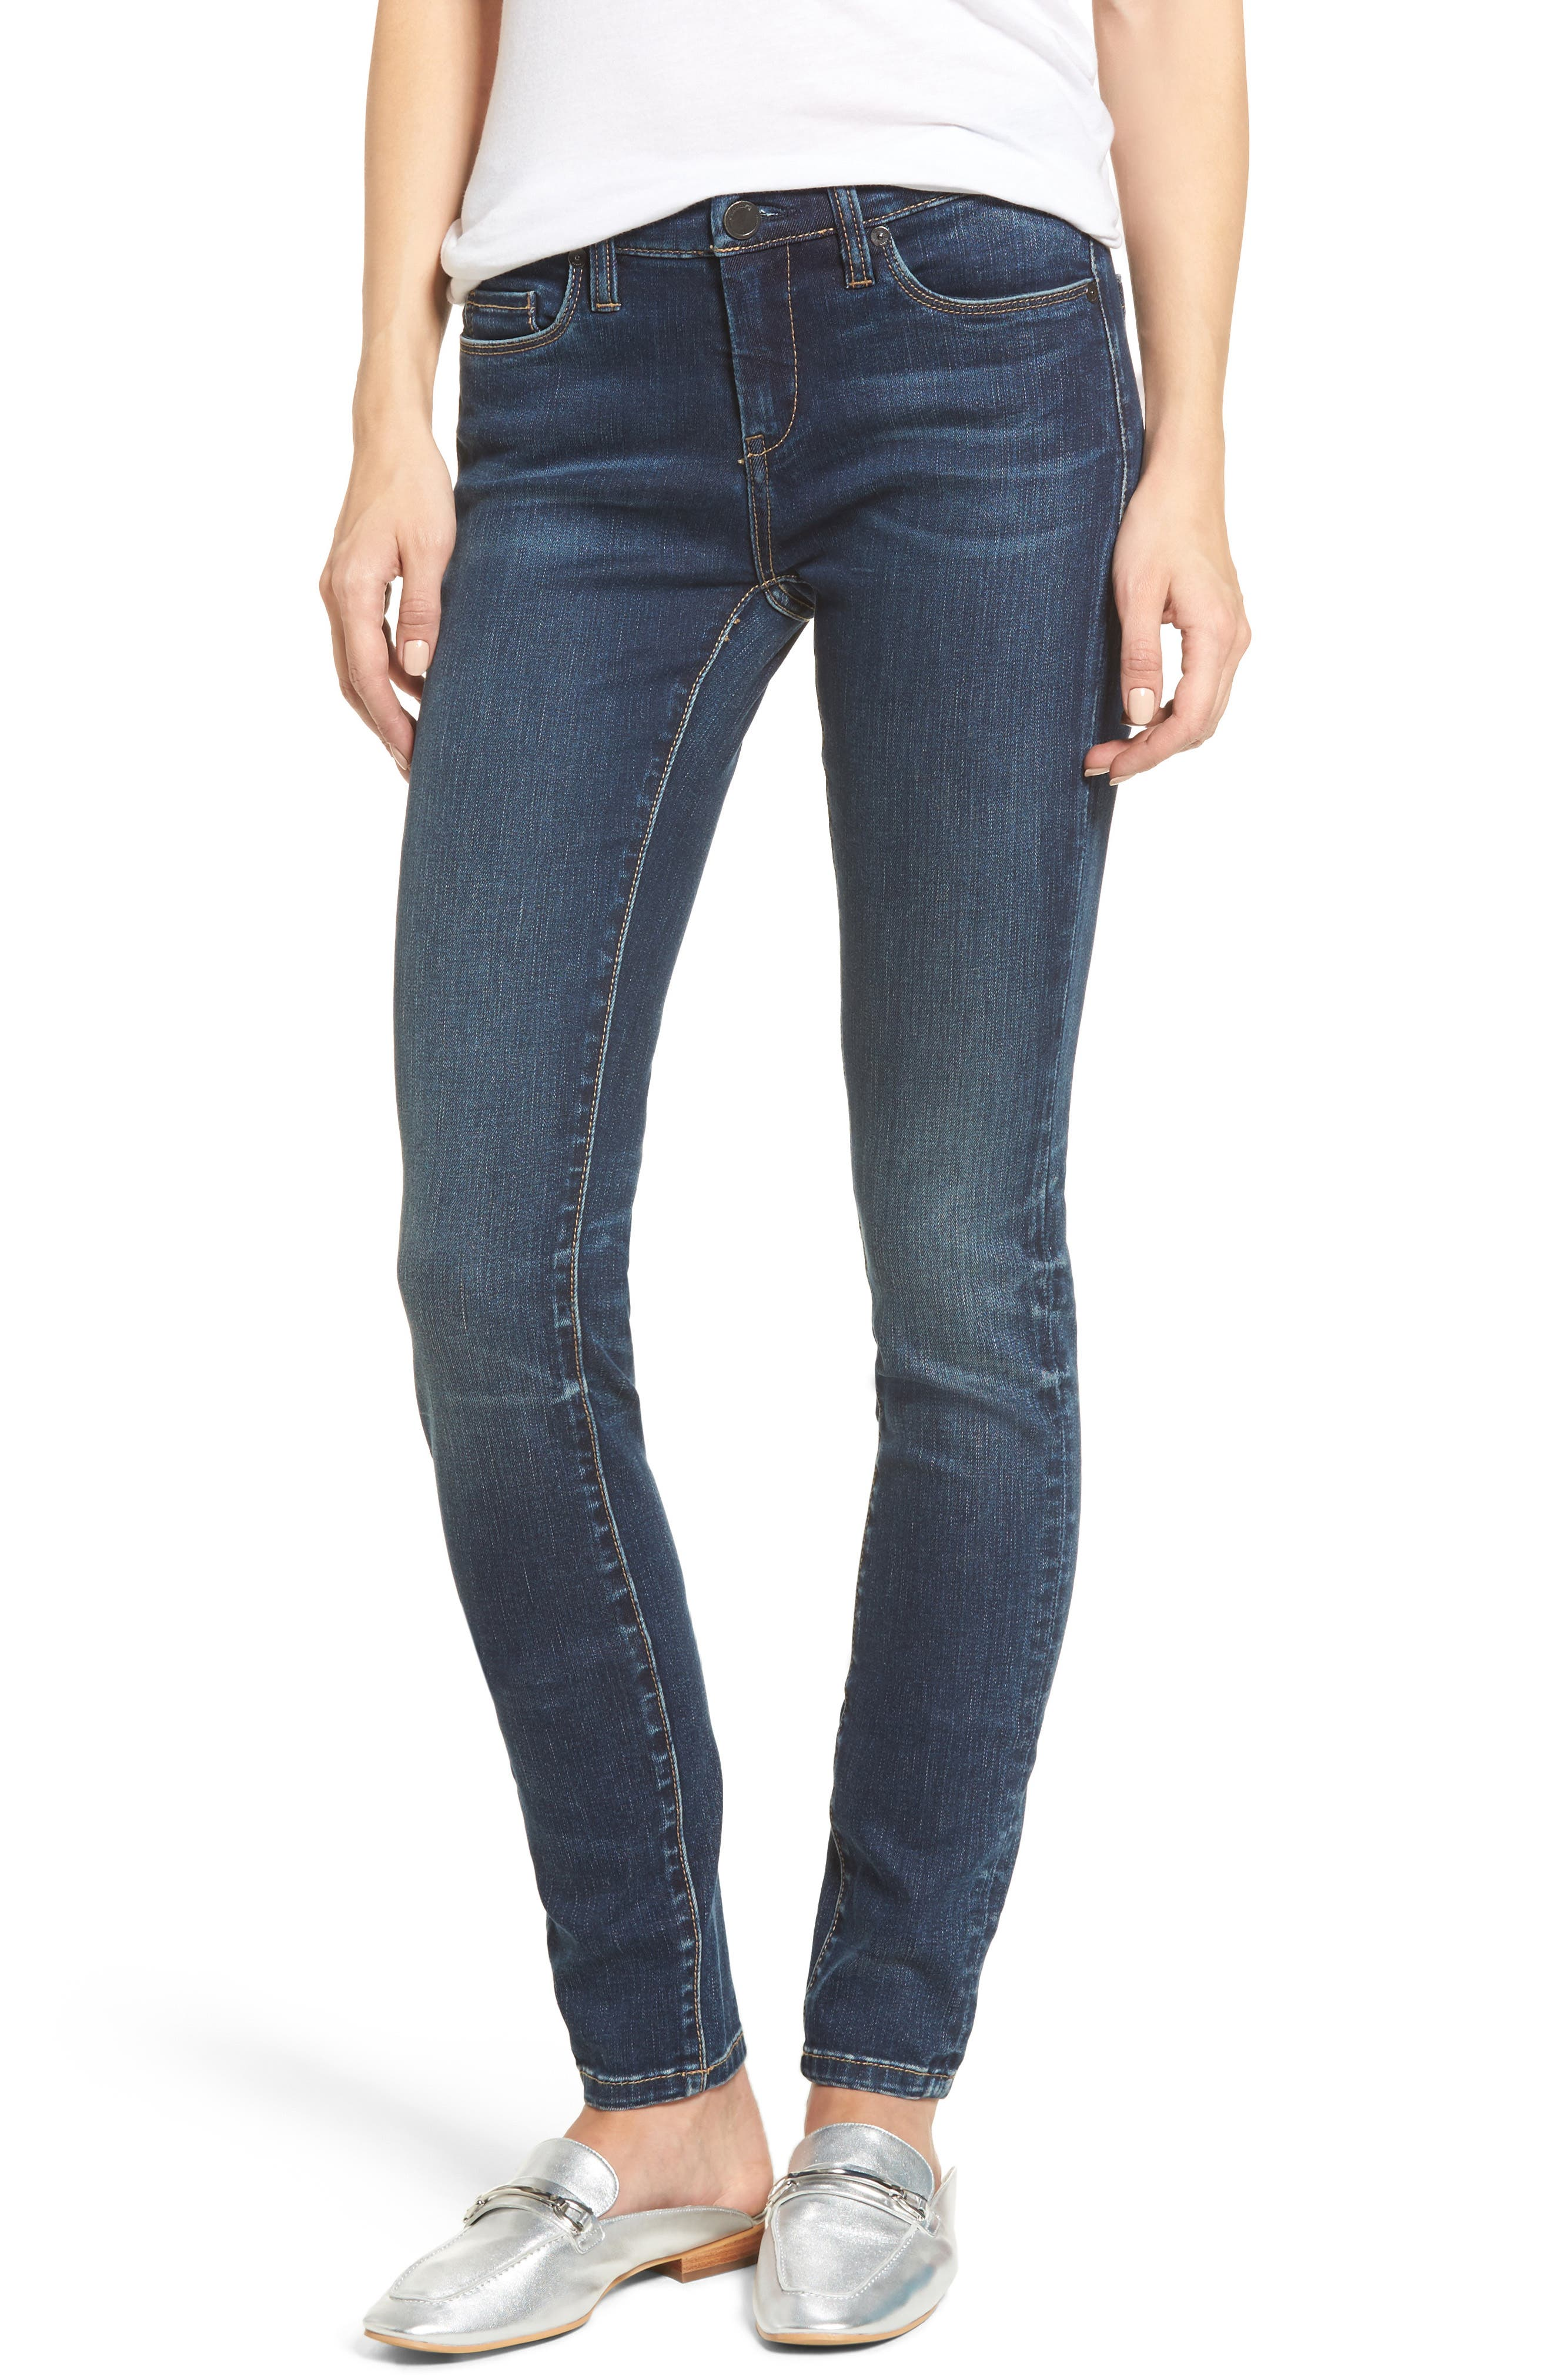 Sleep Song Skinny Jeans,                         Main,                         color, 400